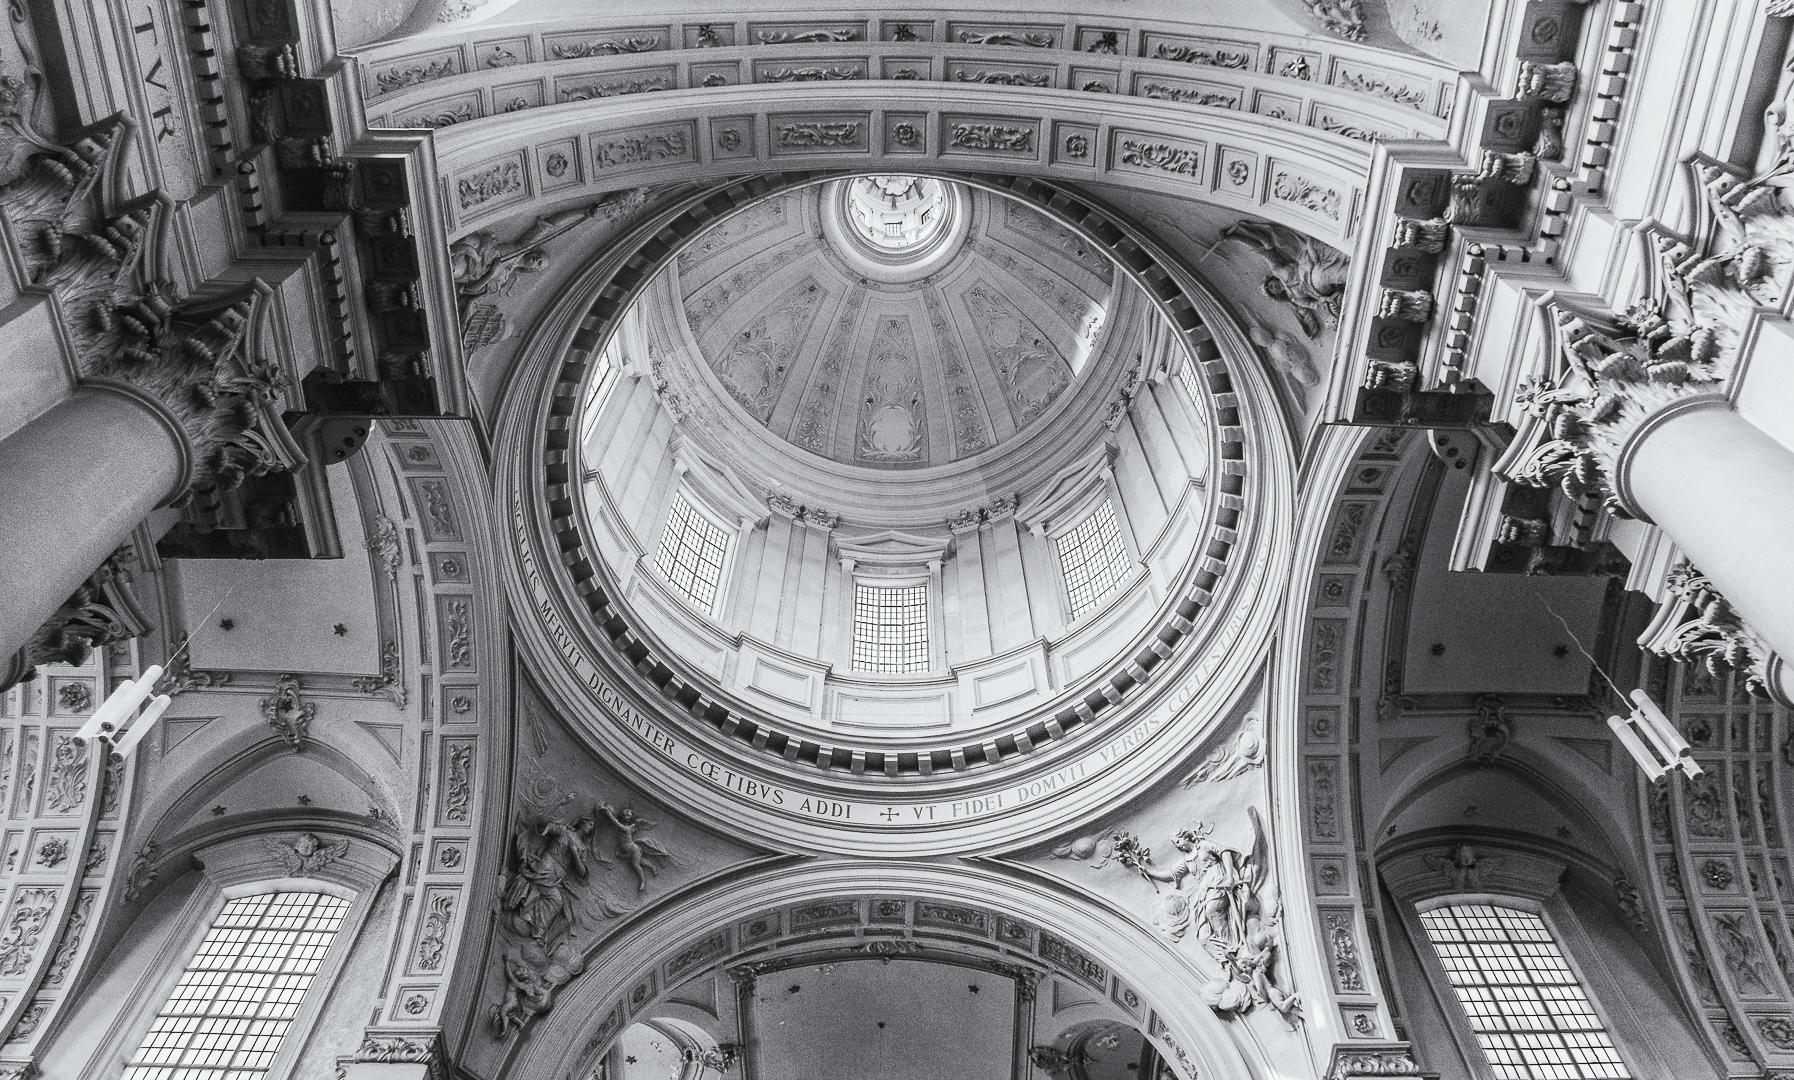 Namur - Cathédrale Saint-Aubain, Belgium